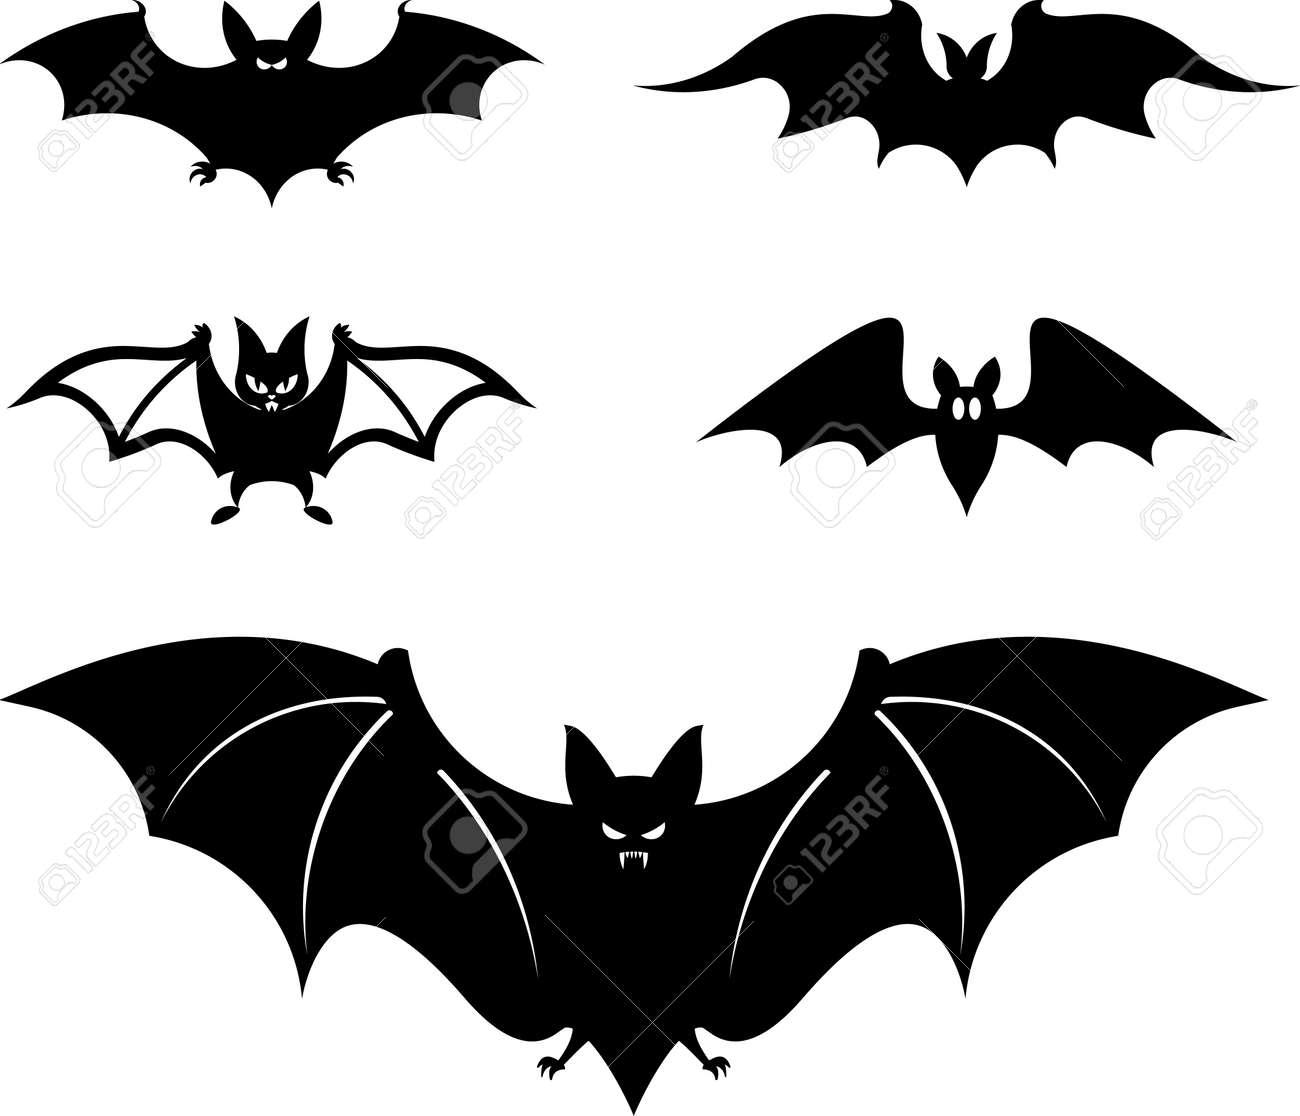 Cartoon style vampire bats Vector illustration - 53139192